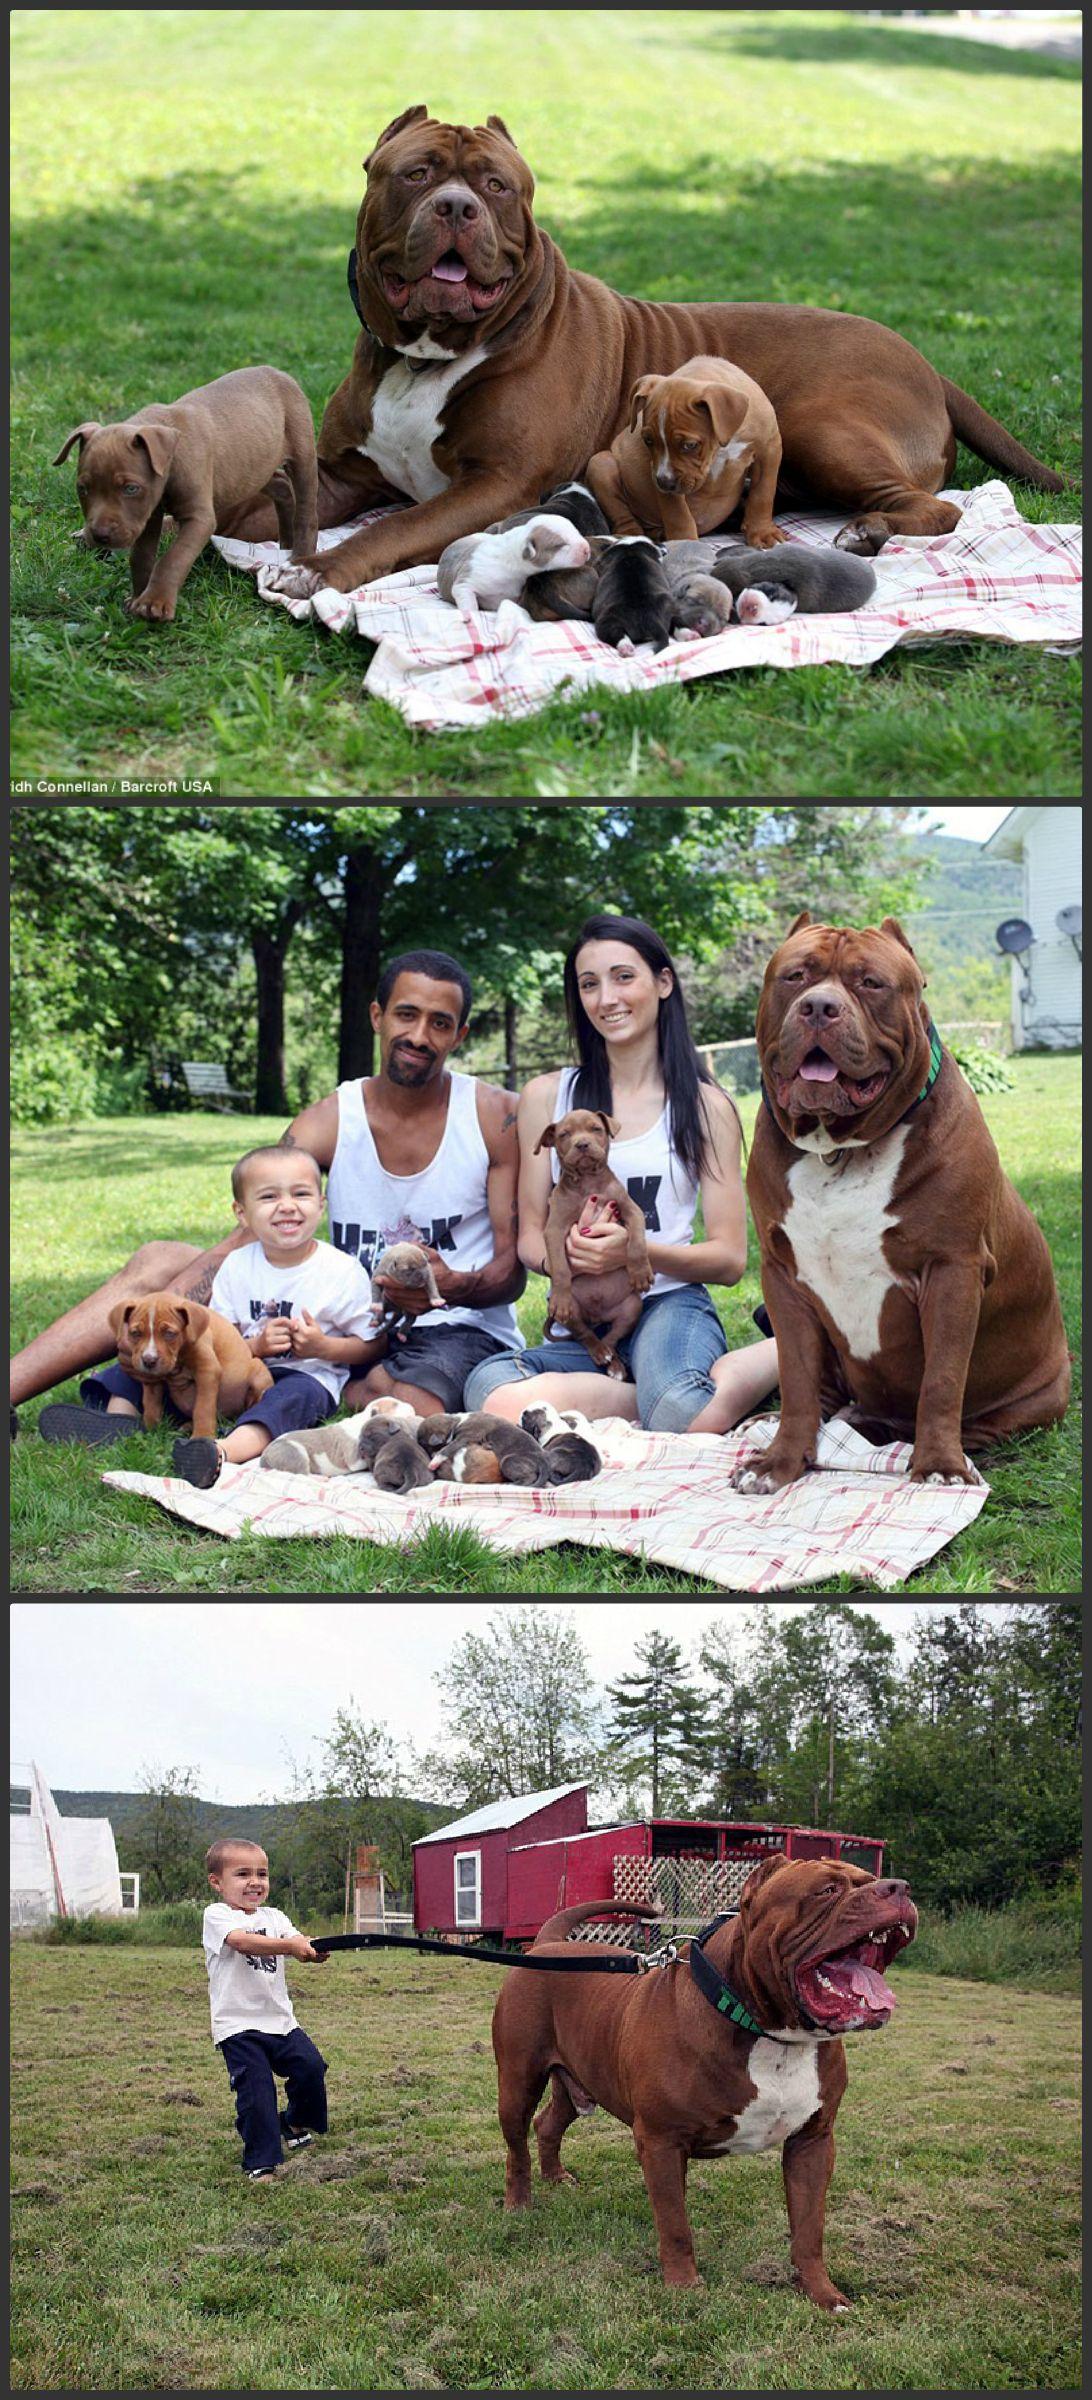 Worlds Largest Pitbull Hulk Fathers Eight Adorable Puppies Worth